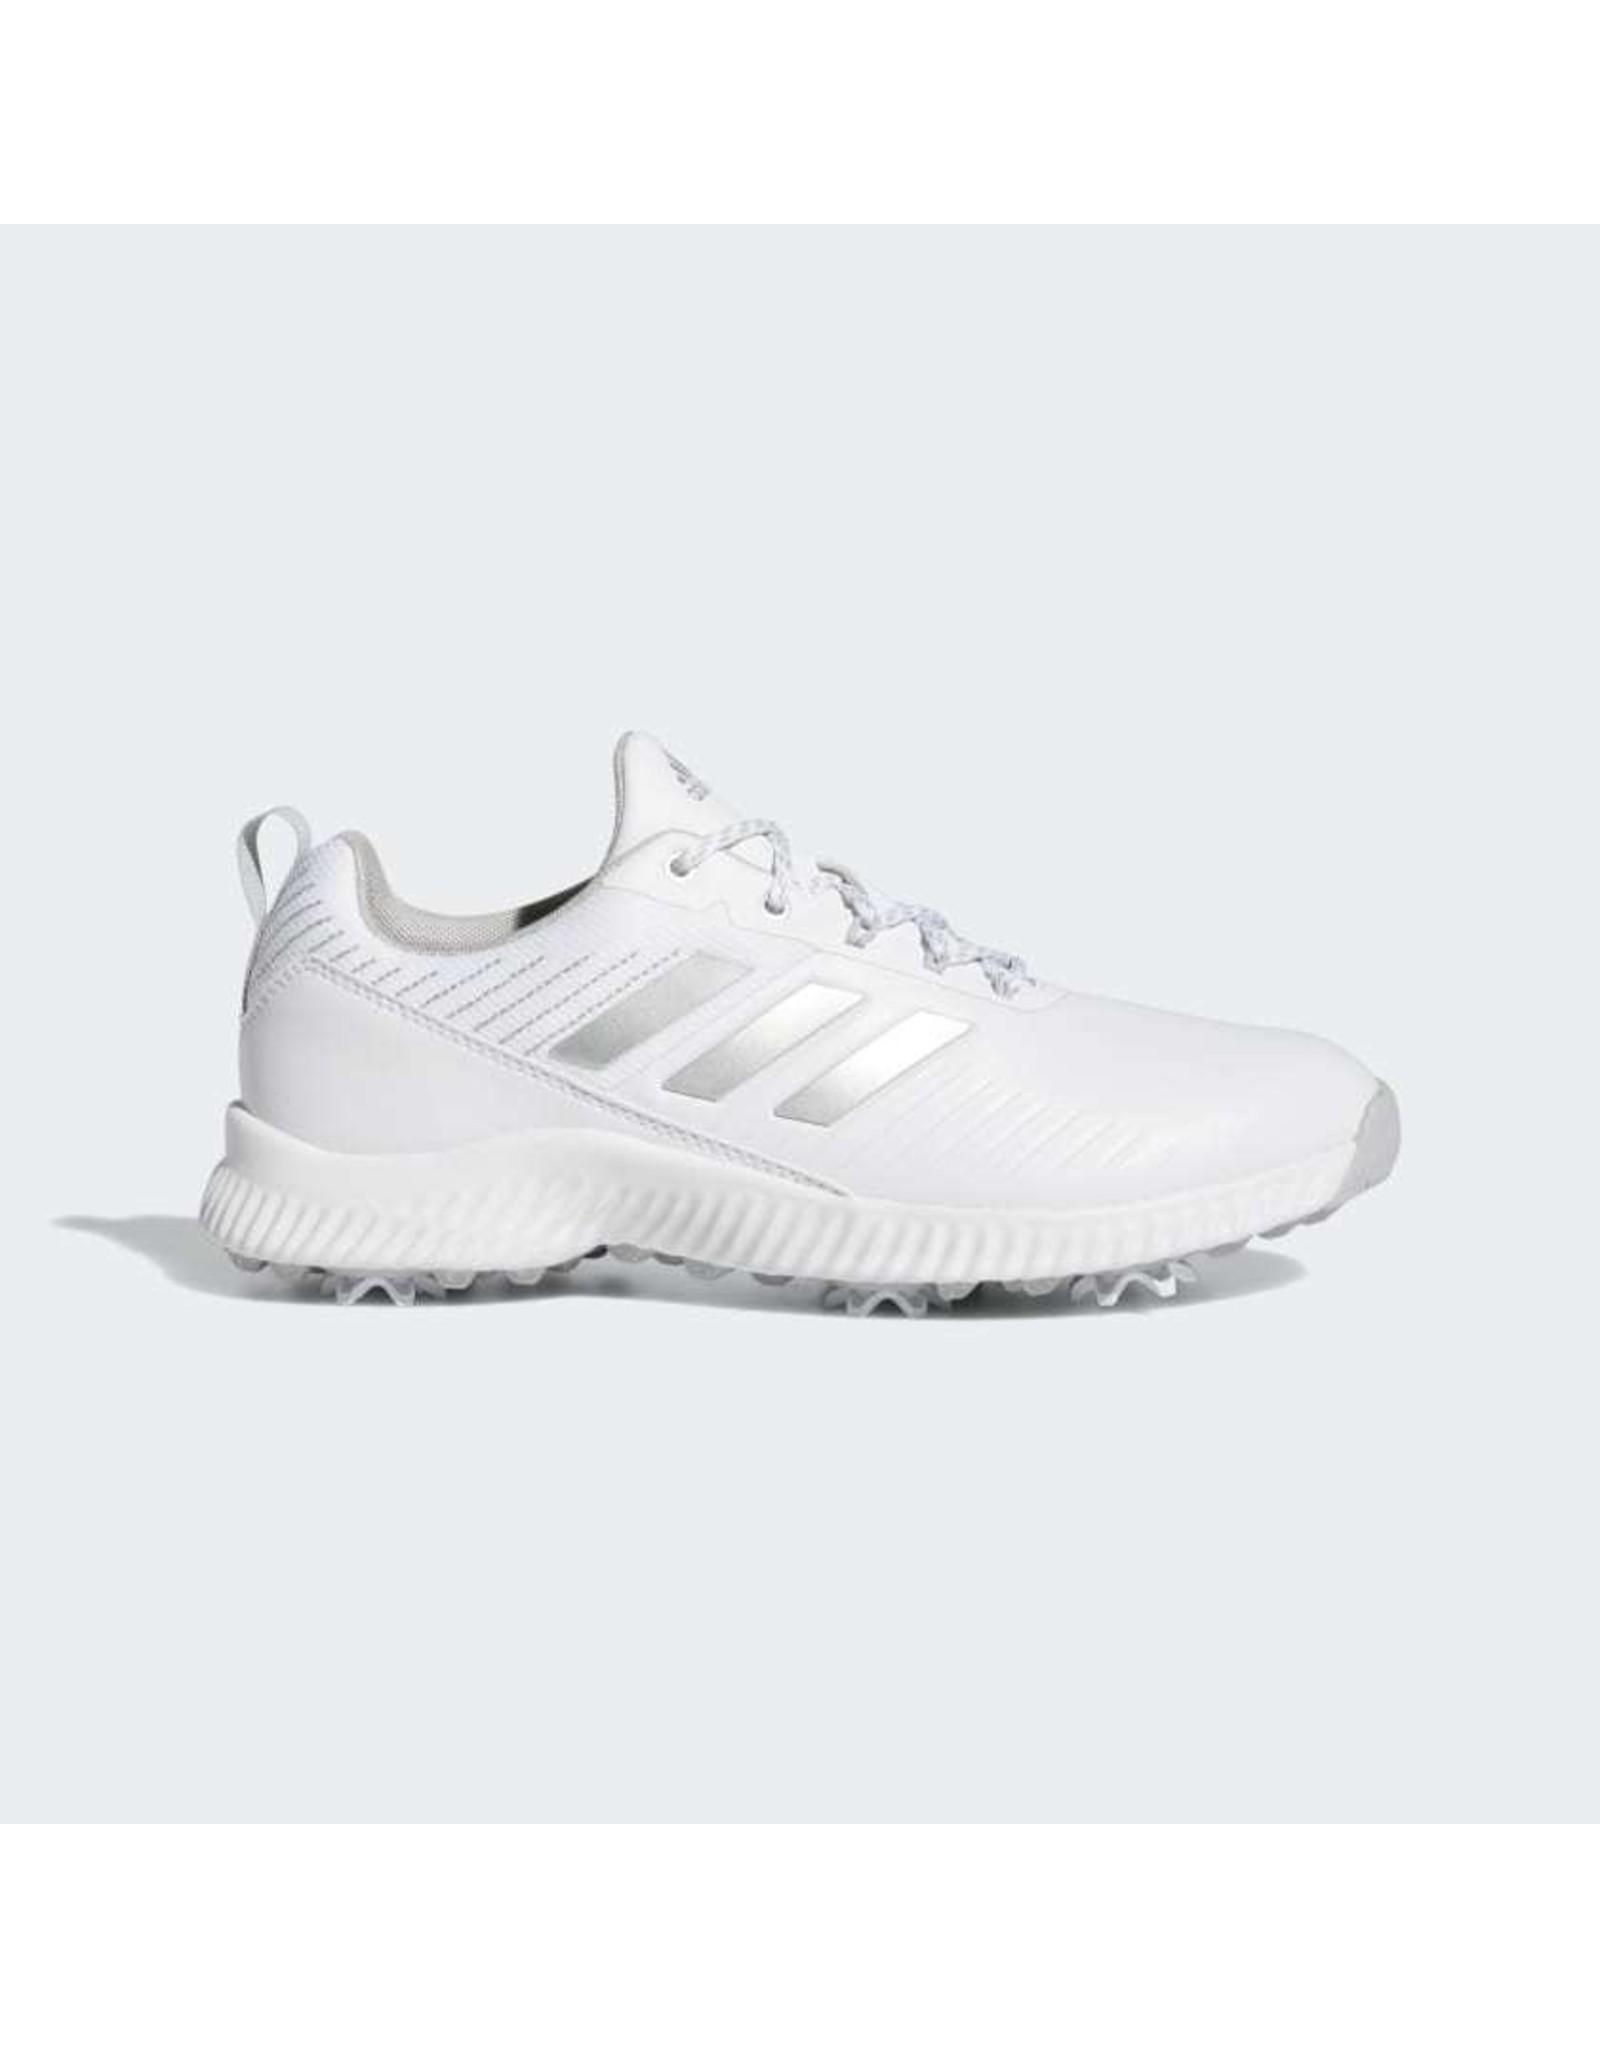 Adidas Adidas Women's Response Bounce 2.0 White